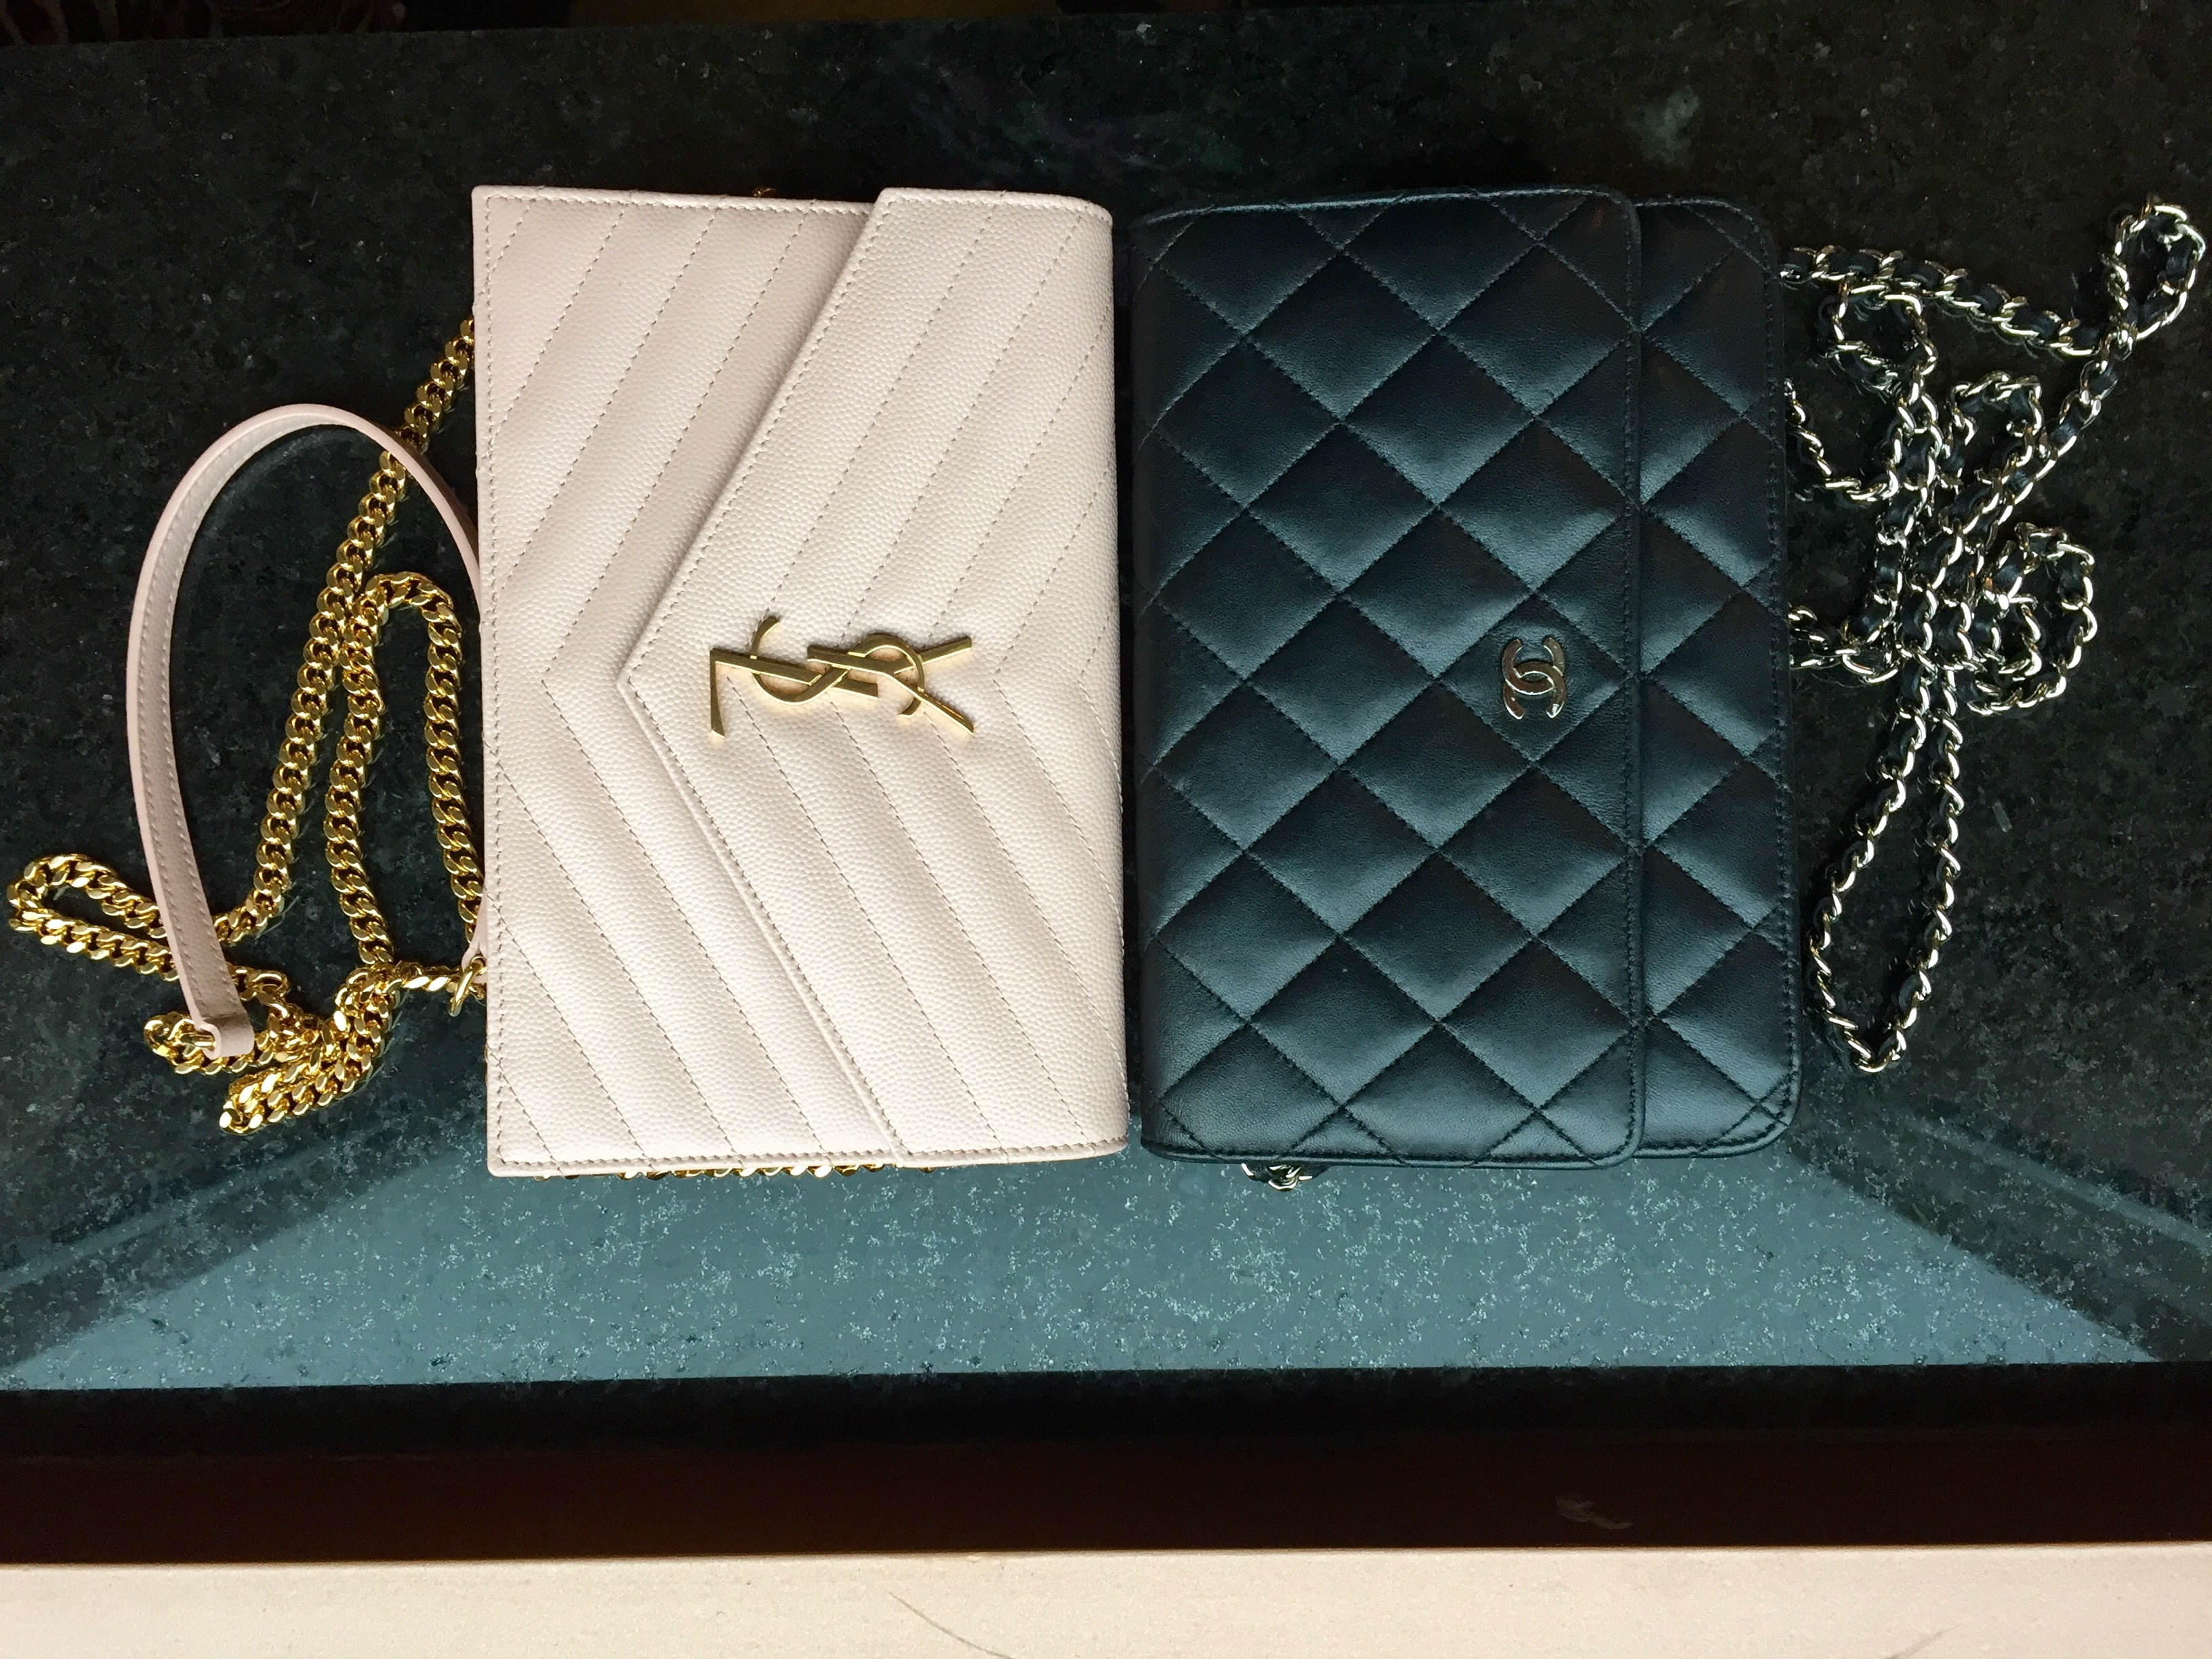 0c7f2c9119c9 Chanel vs. YSL Wallet on Chain Comparison (WOC) - PurseBop